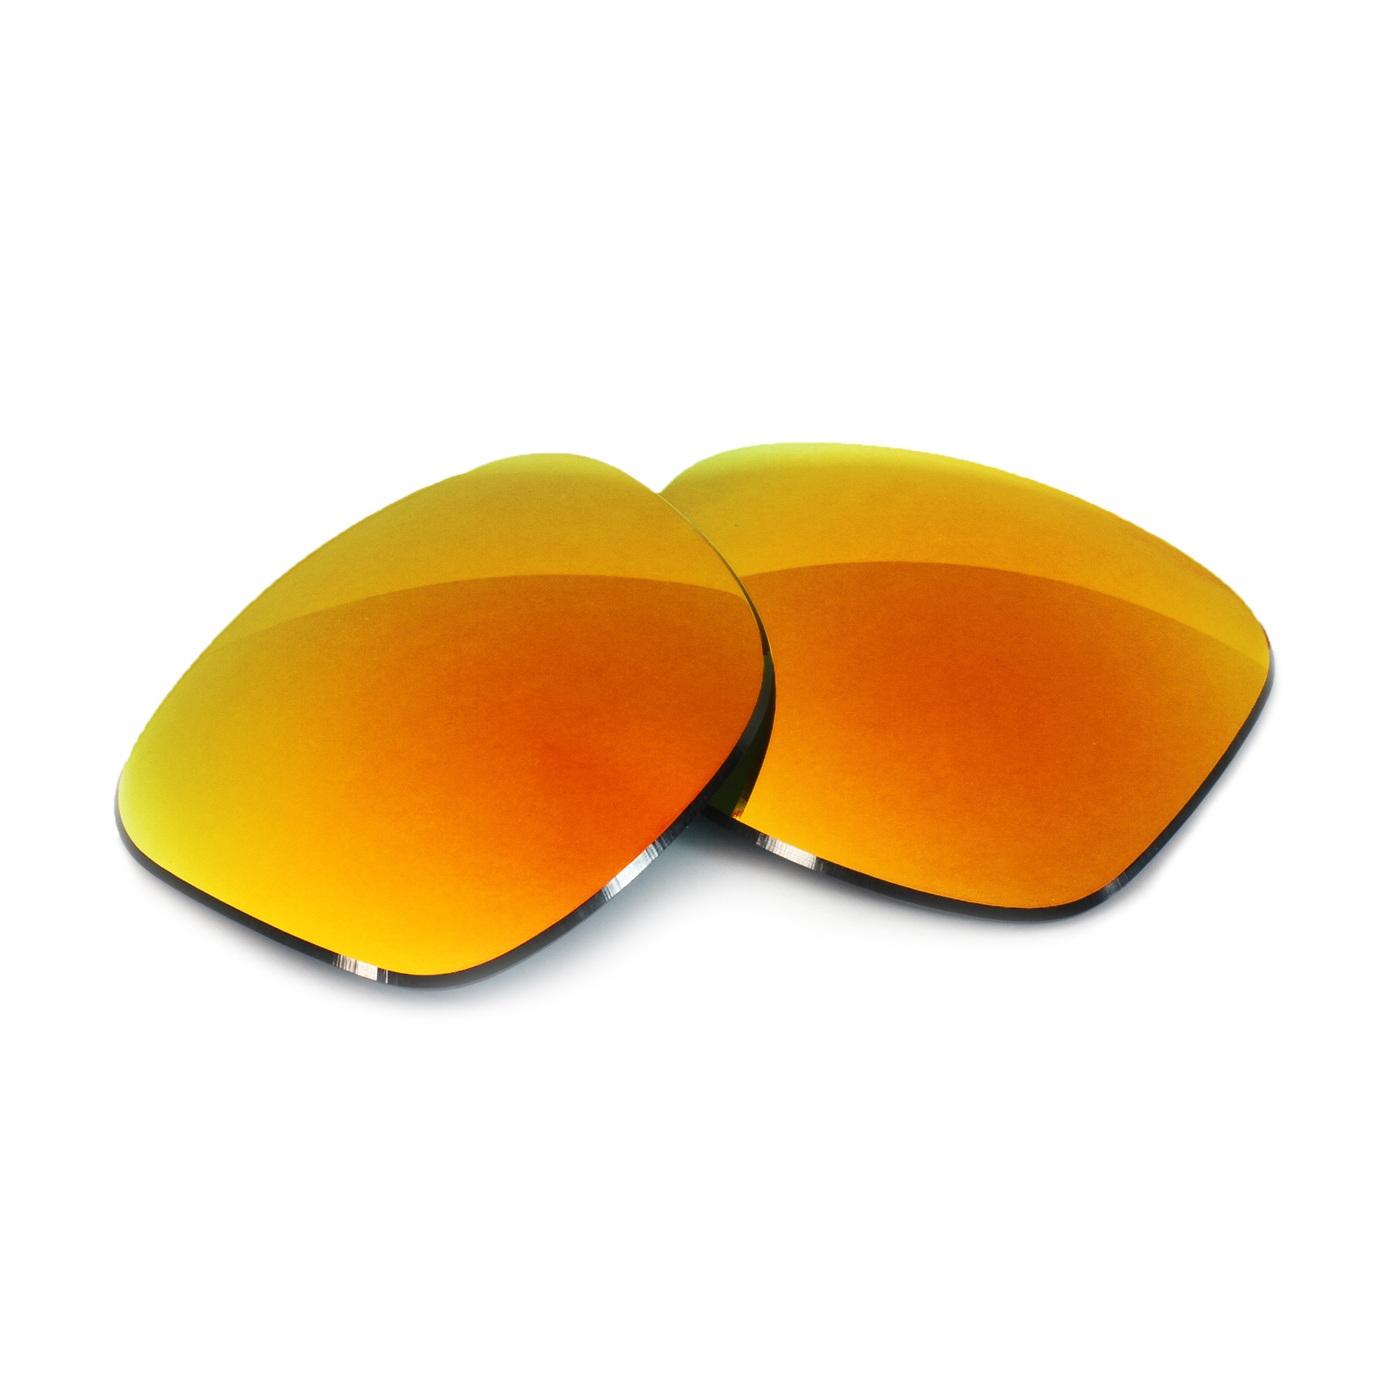 Fuse Lenses Polarized Replacement Lenses for Maui Jim Red Sands MJ-432